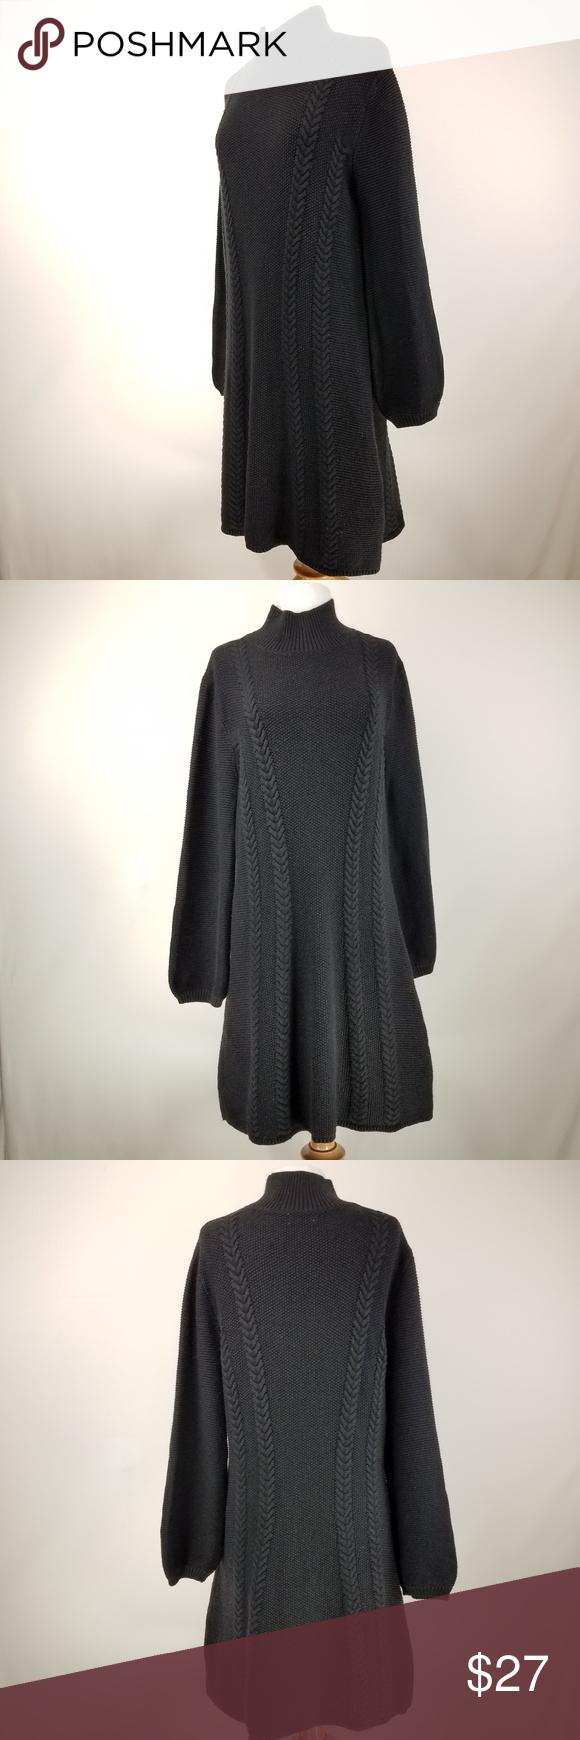 Sweater dress black turtleneck cable knit ml my posh picks